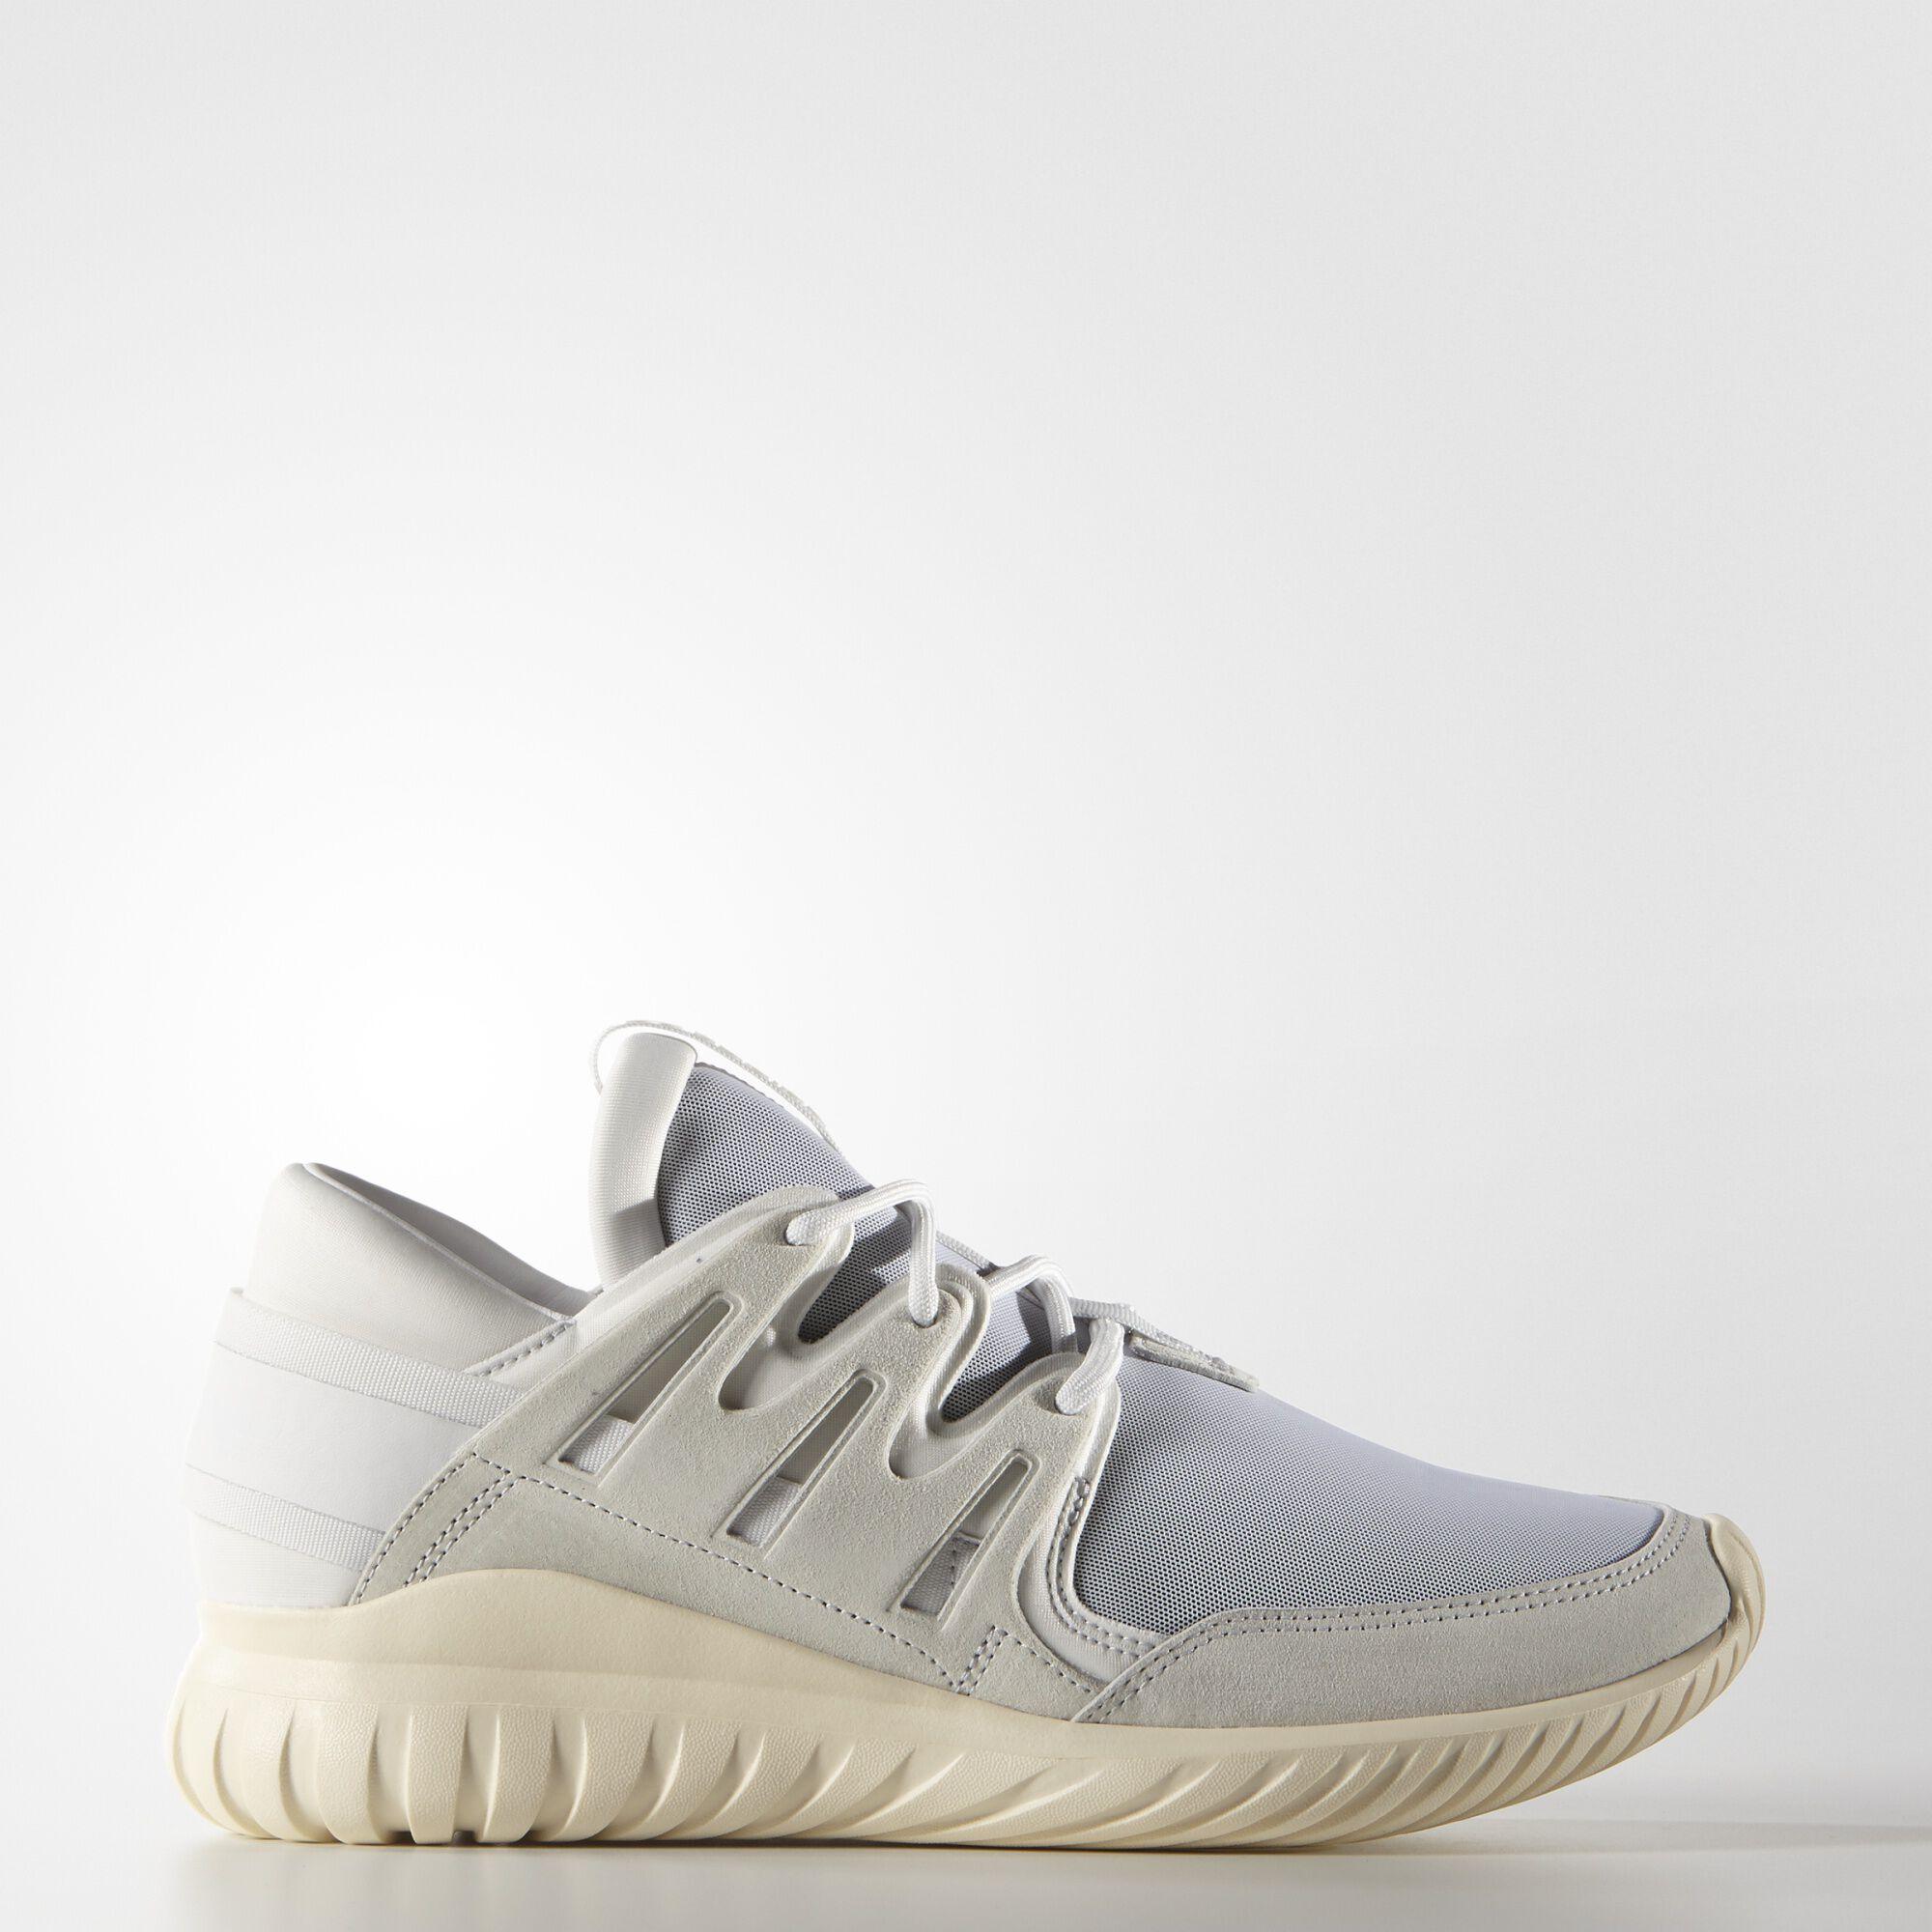 Adidas Tubular Nova White